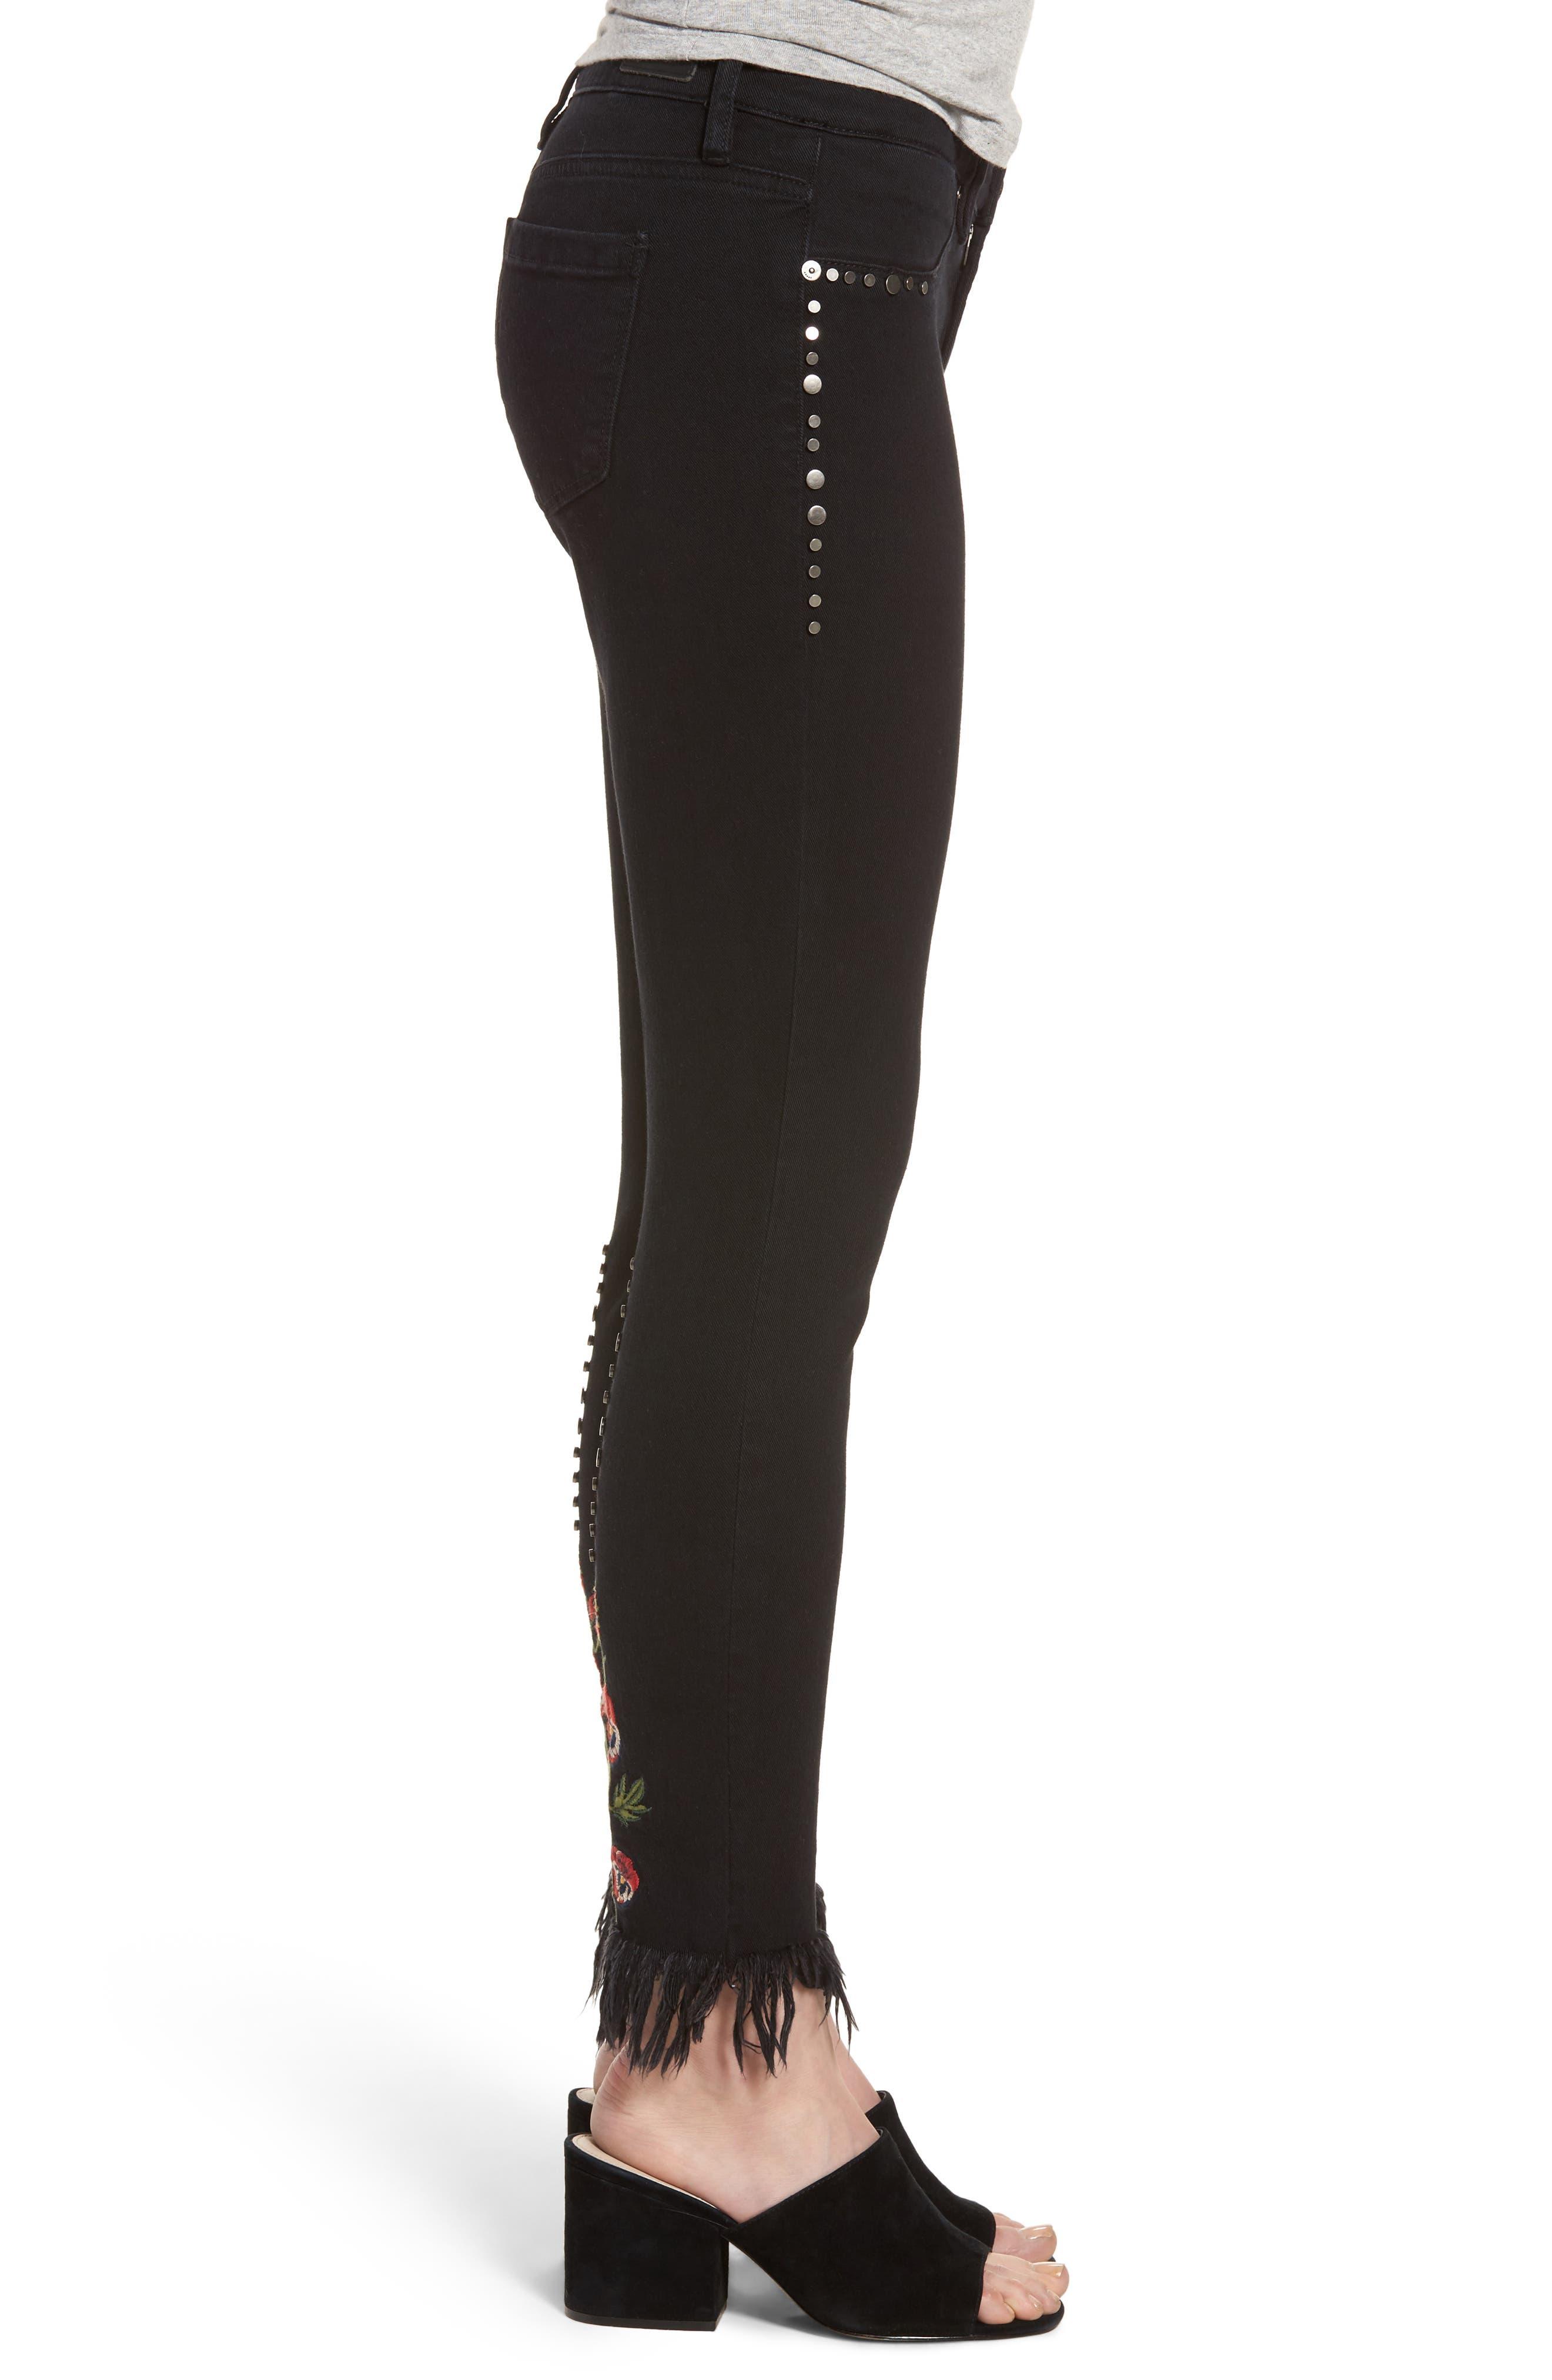 Embroidered & Studded Skinny Jeans,                             Alternate thumbnail 4, color,                             Hidden Talent Black